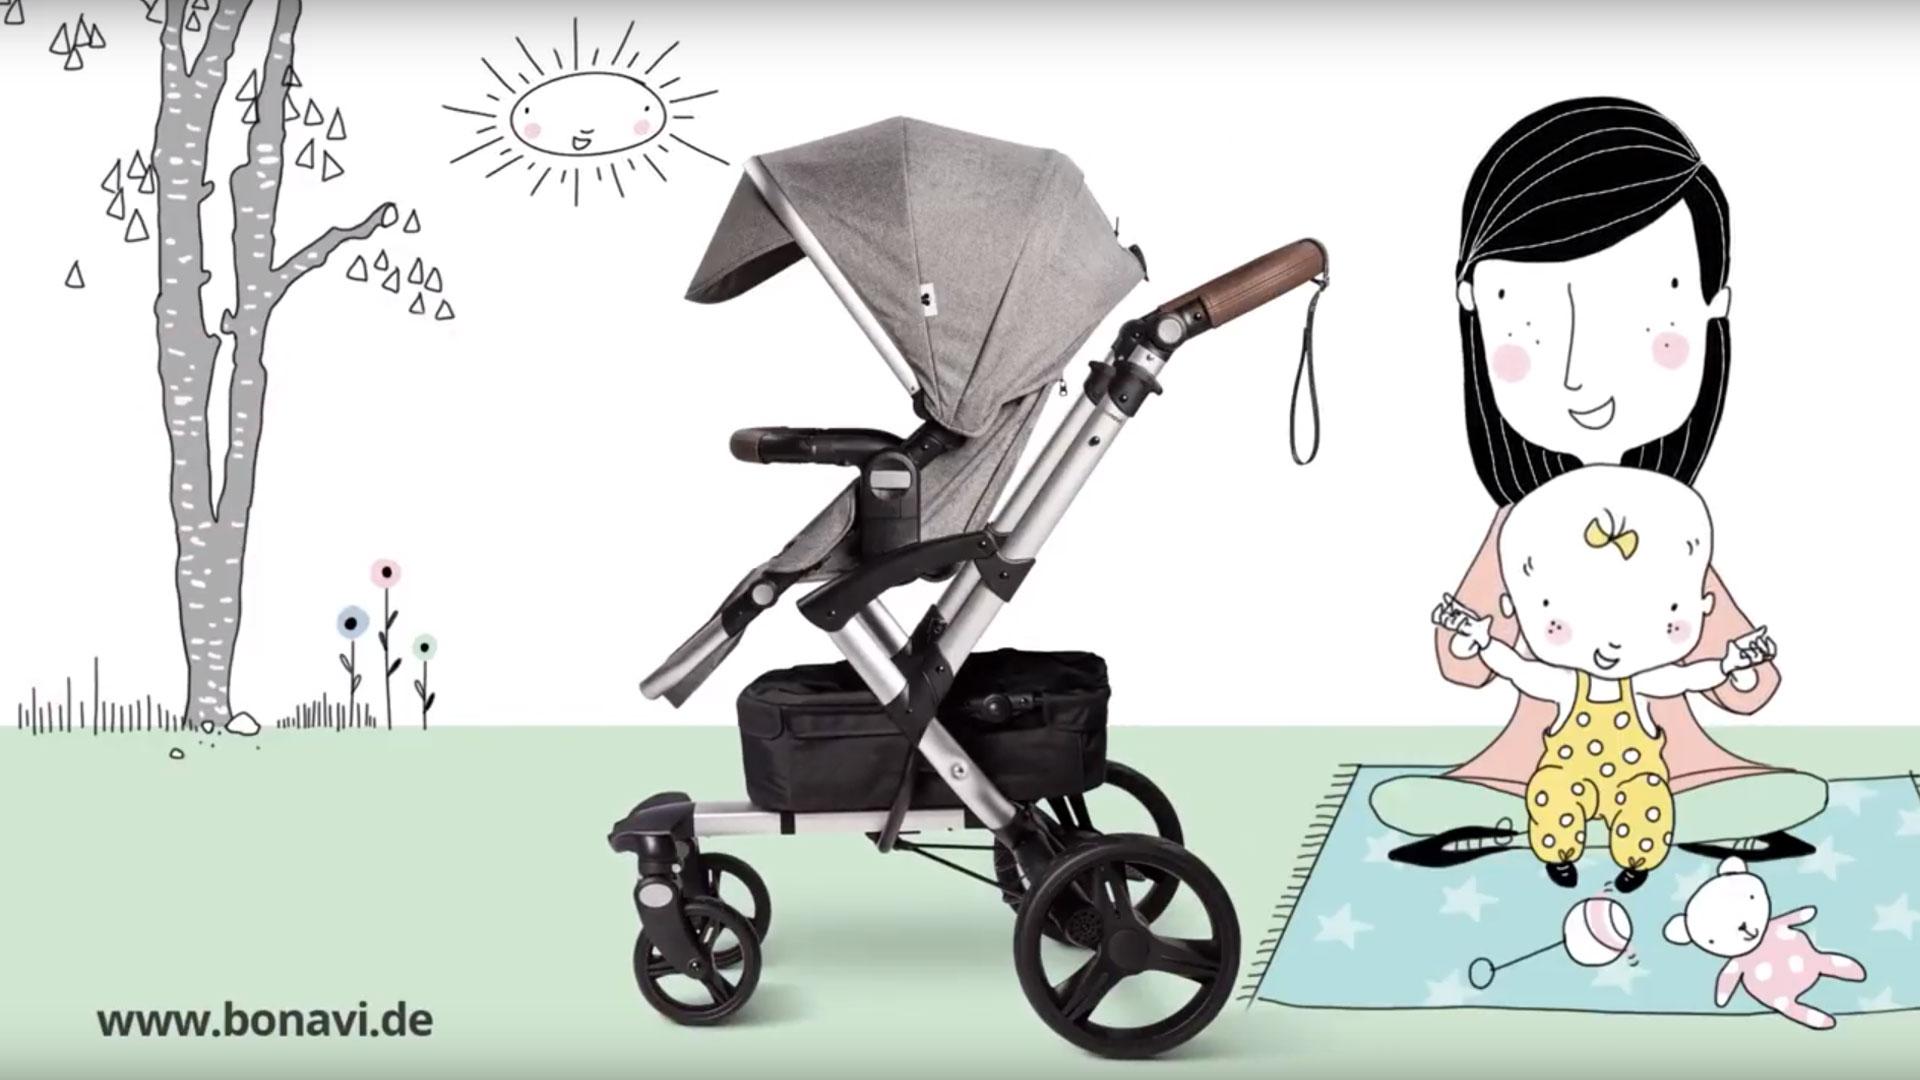 Campaign: Bonavi strollers